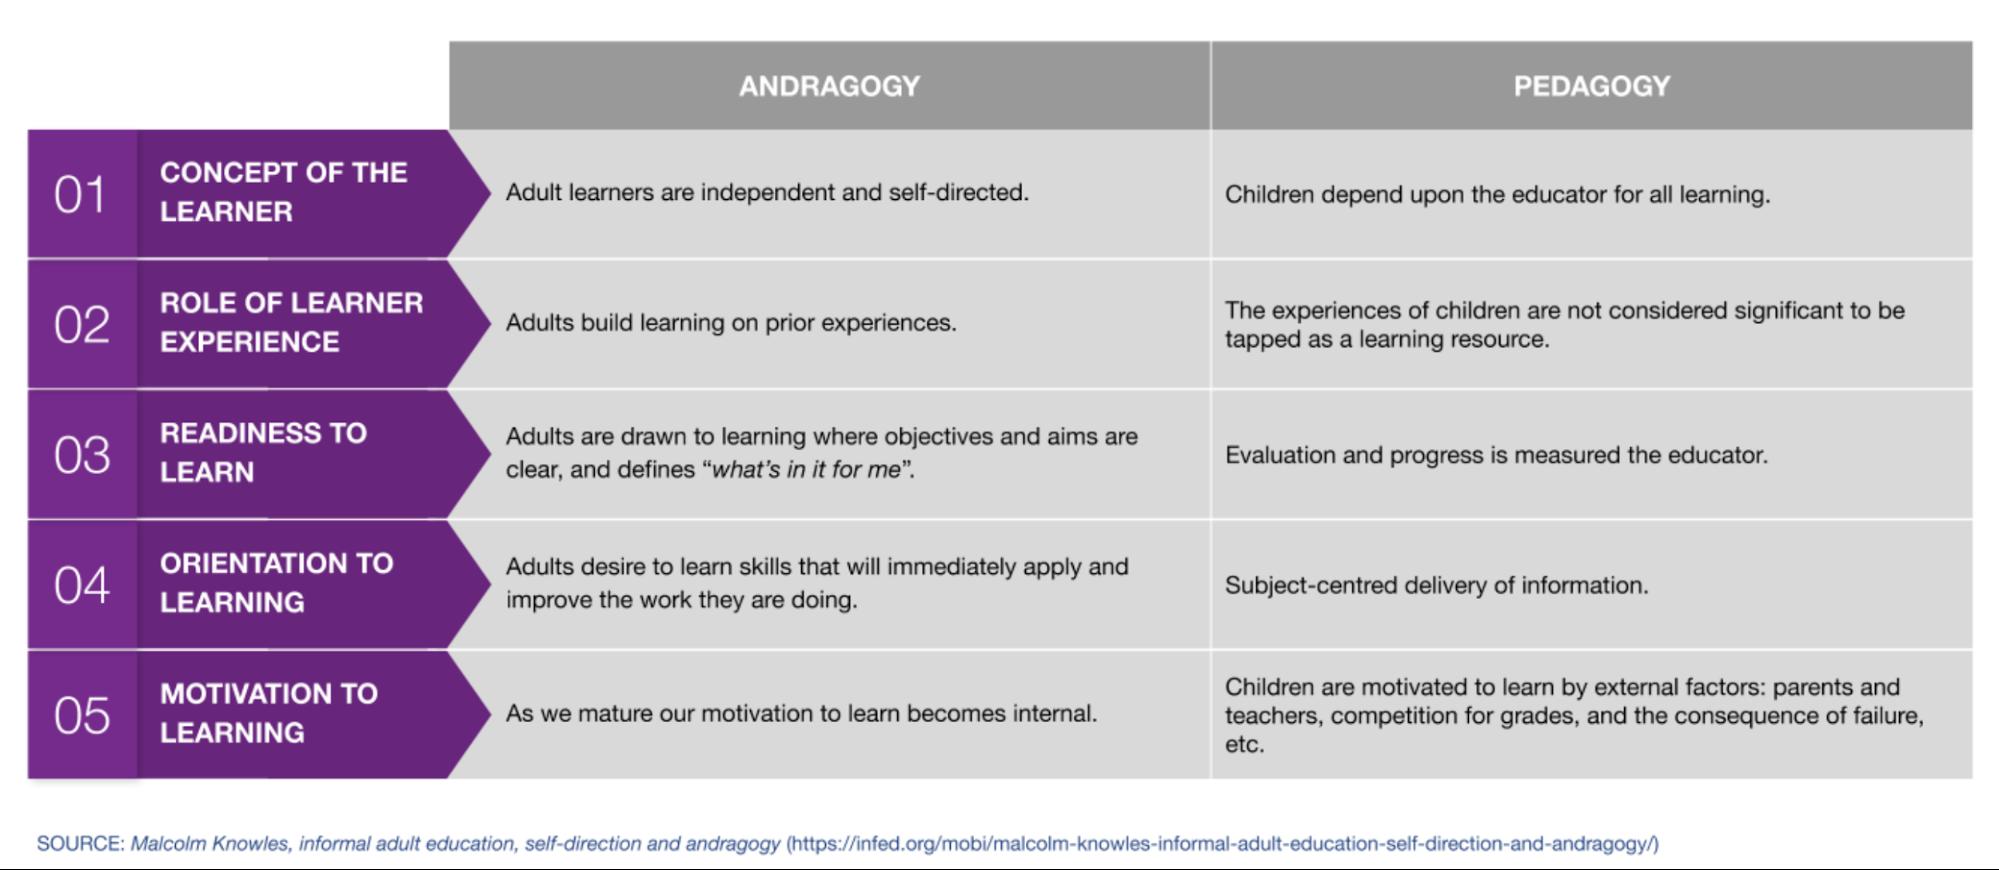 image chart pedagogy vs andragogy 5 assumptions